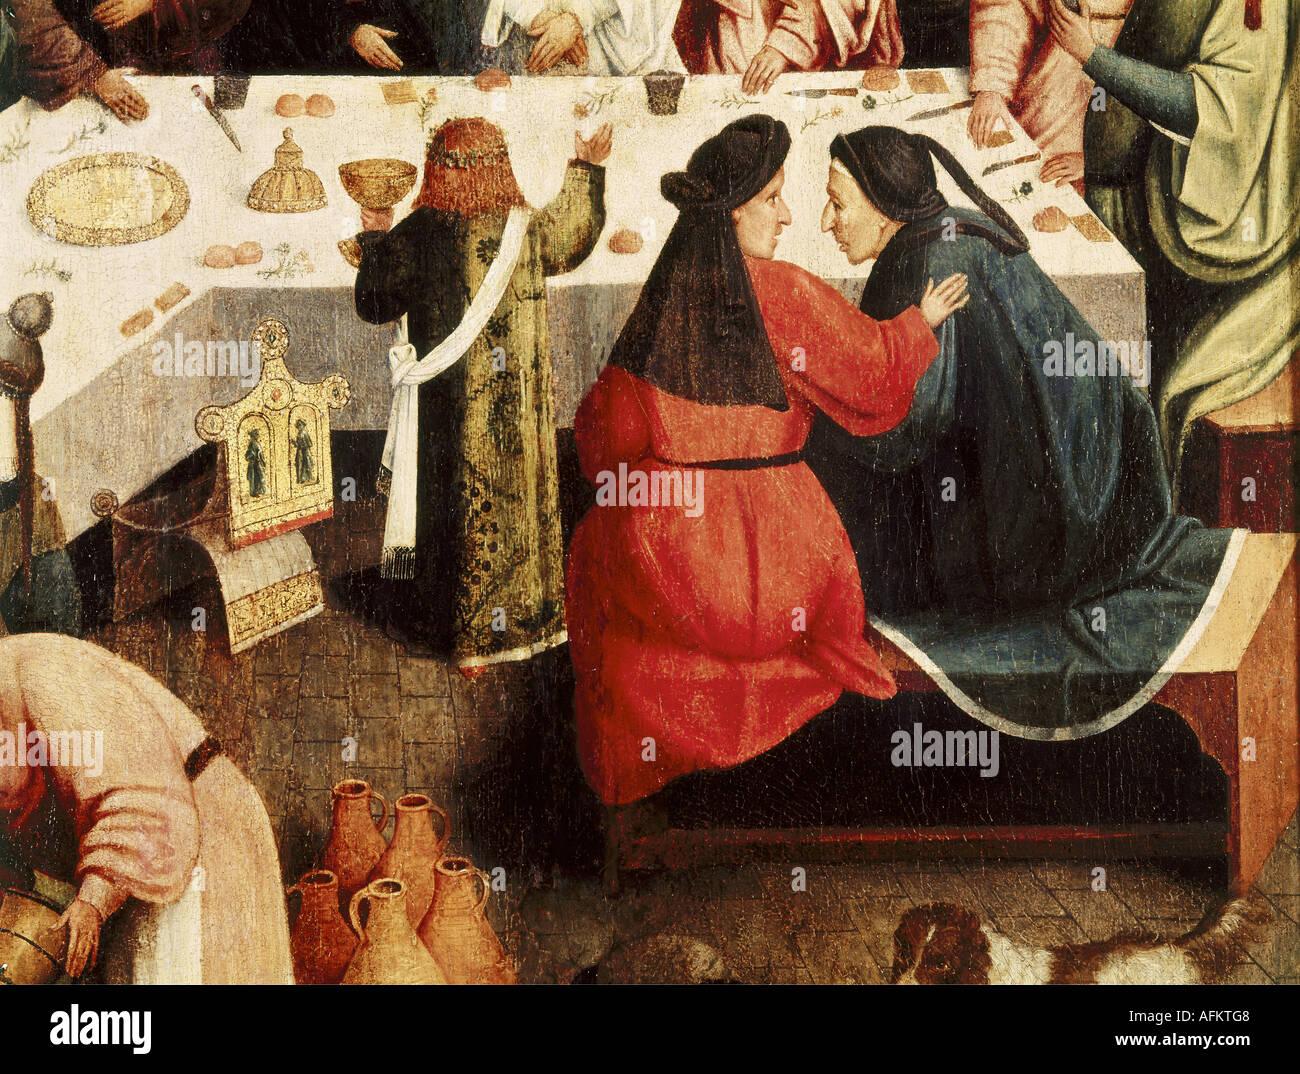 """Bellas Artes, arte religioso, pintura, ""matrimonio de Caná', artista desconocido, después de 1554, óleo sobre panel, 93 cm x 72 cm, Boyman Imagen De Stock"